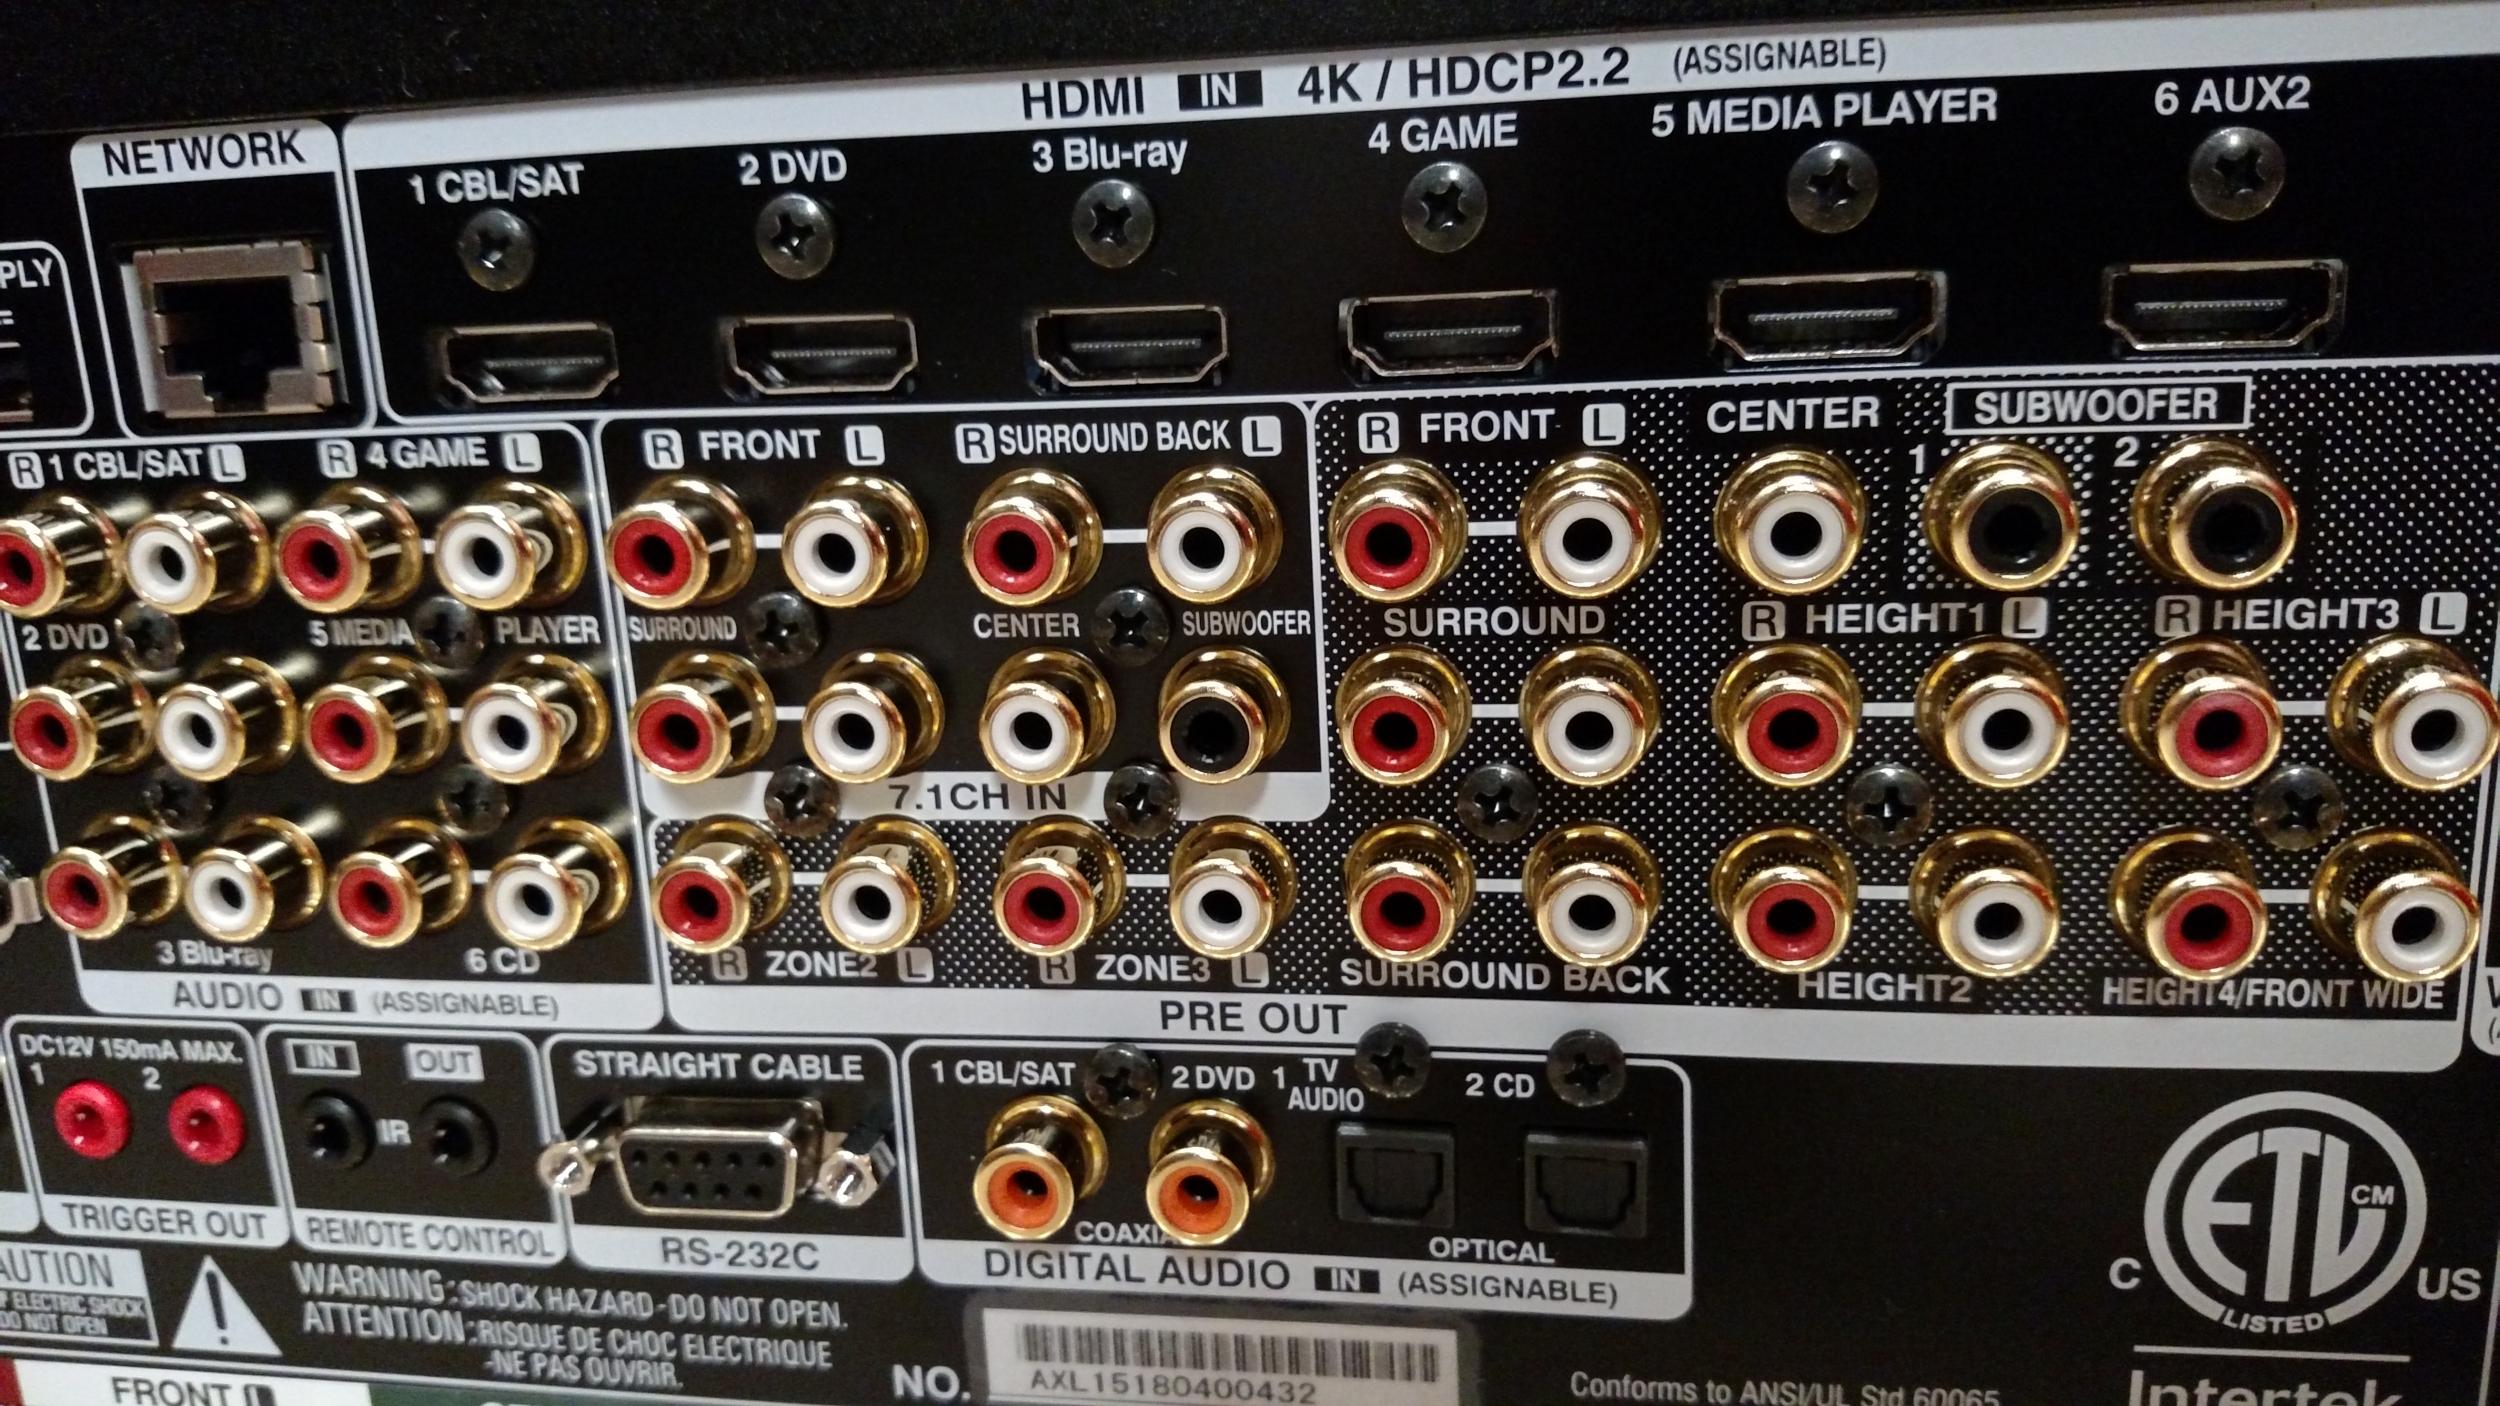 Denon AVR-X8500H rear panel audio inputs & outputs